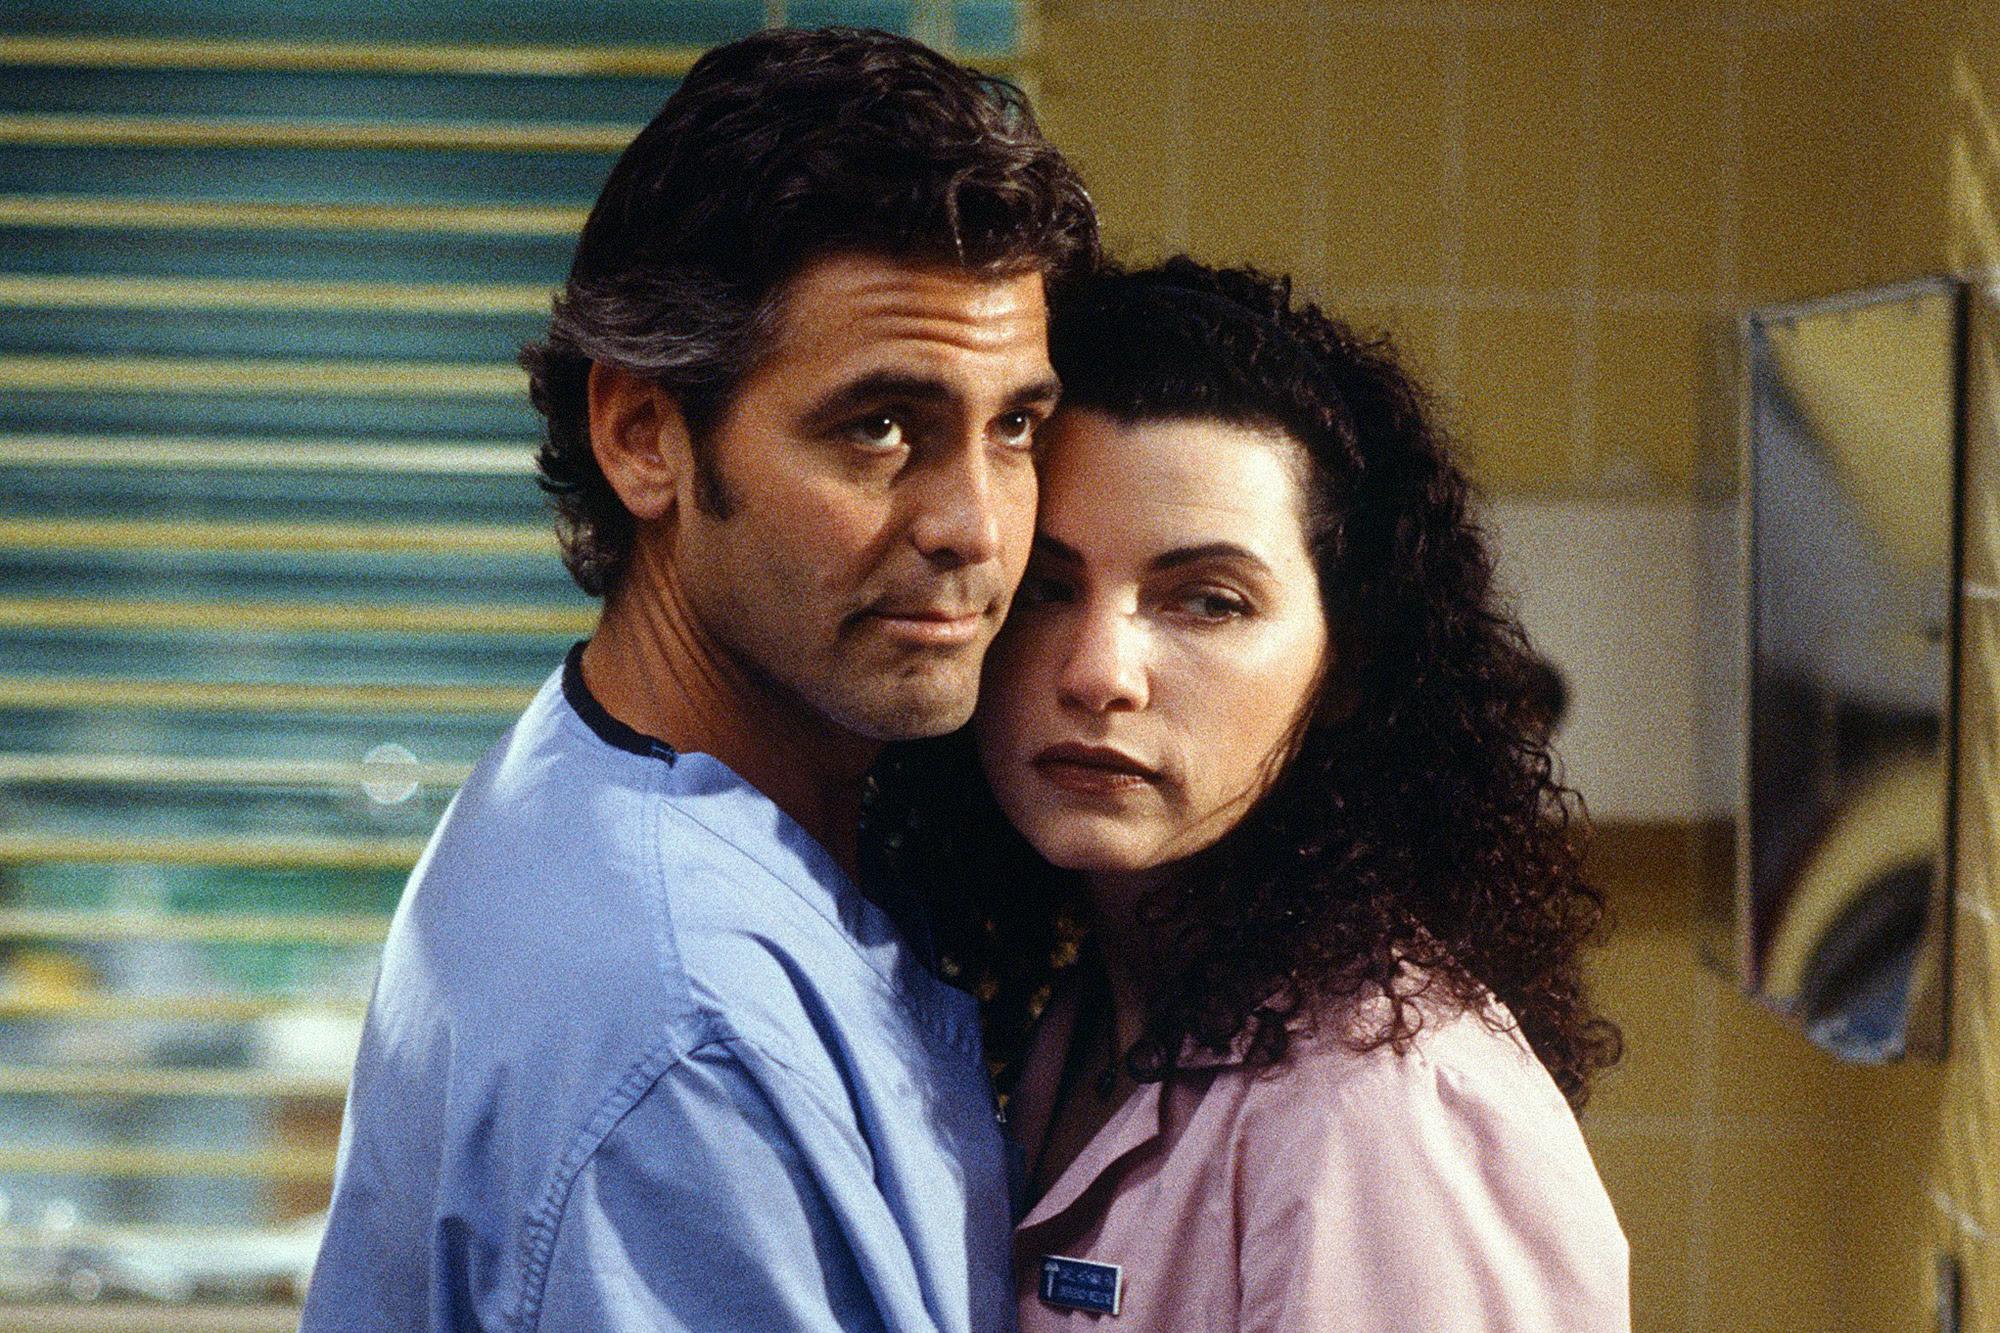 George Clooney, Julianna Margulies hold mini ER reunion in New York   EW.com